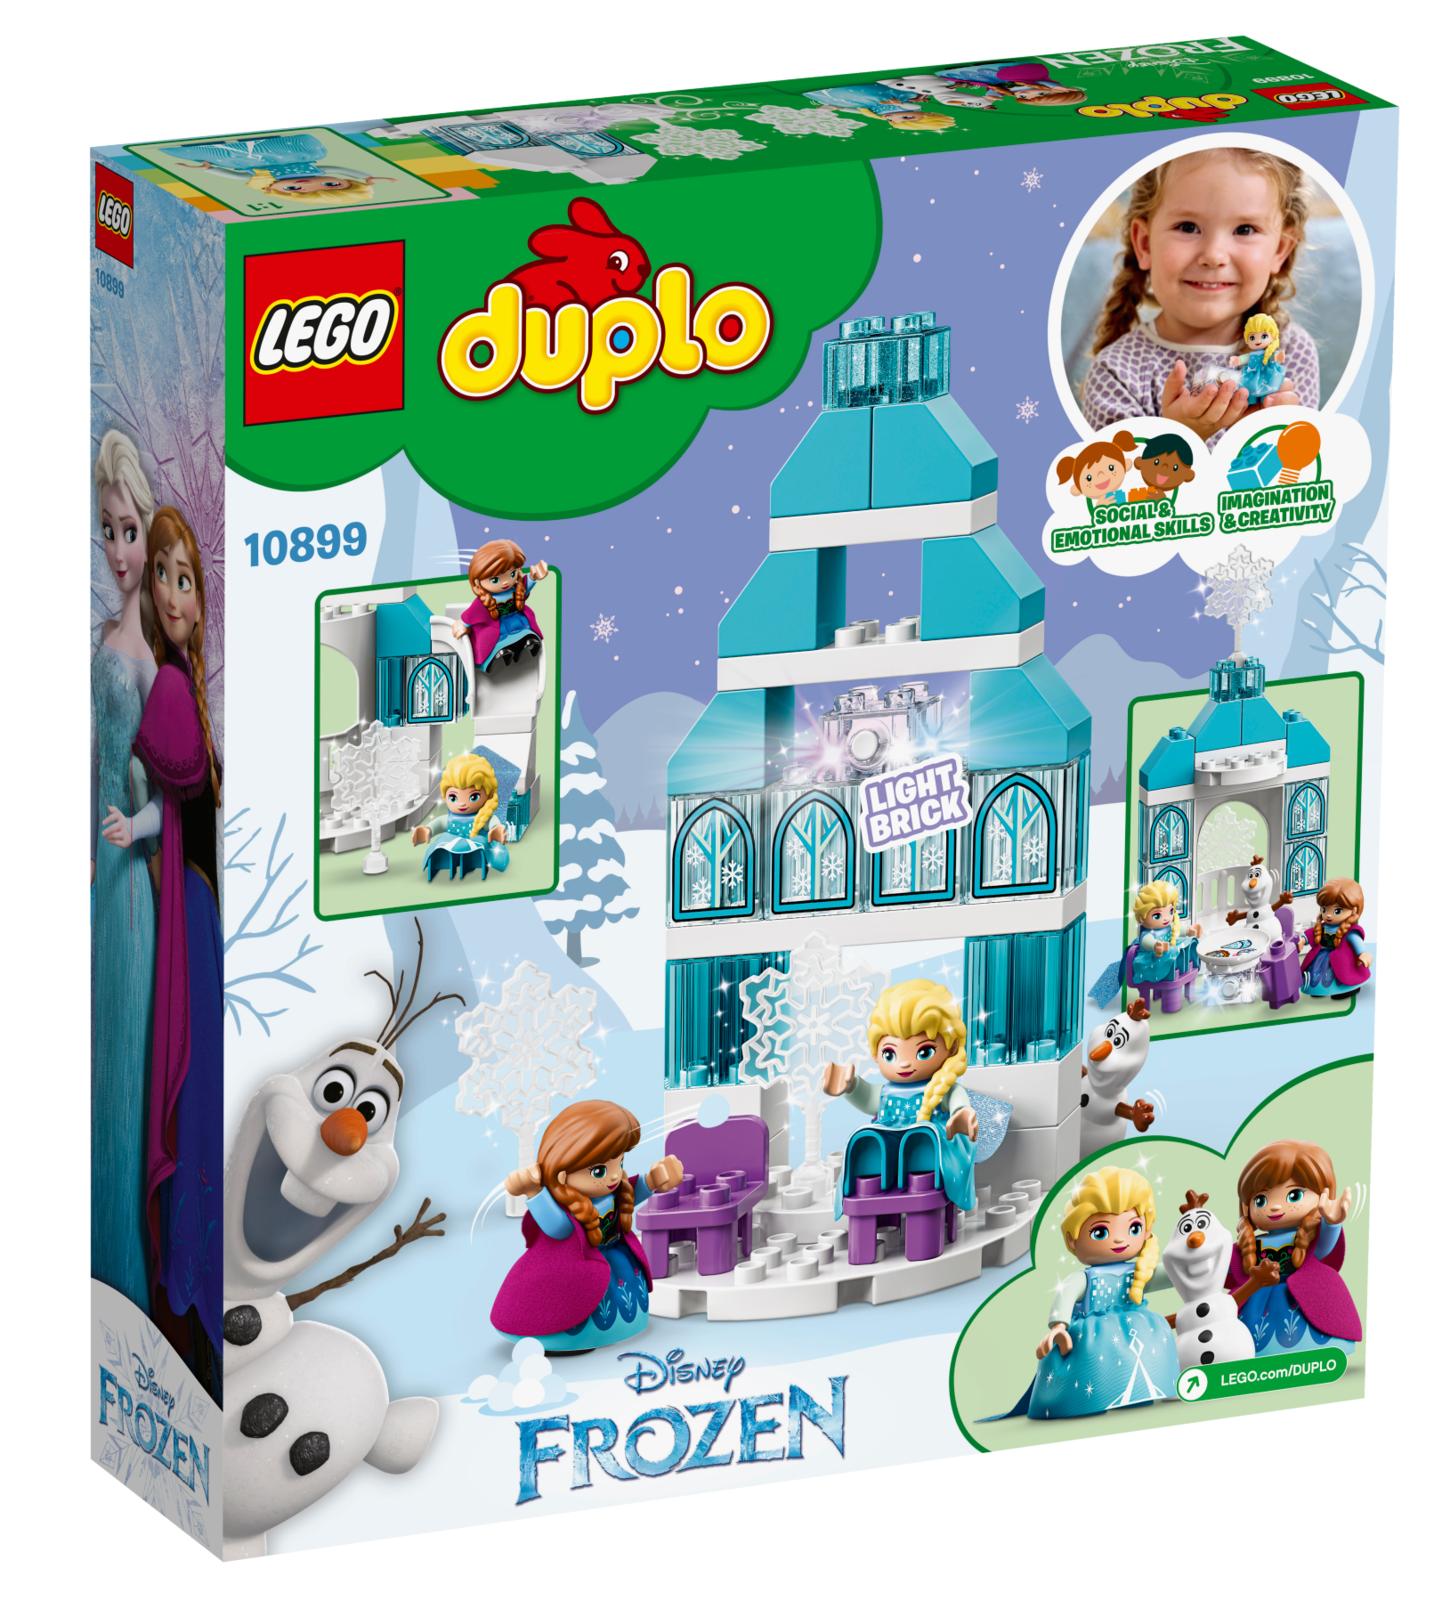 LEGO Duplo: Frozen Ice Castle - (10899) image